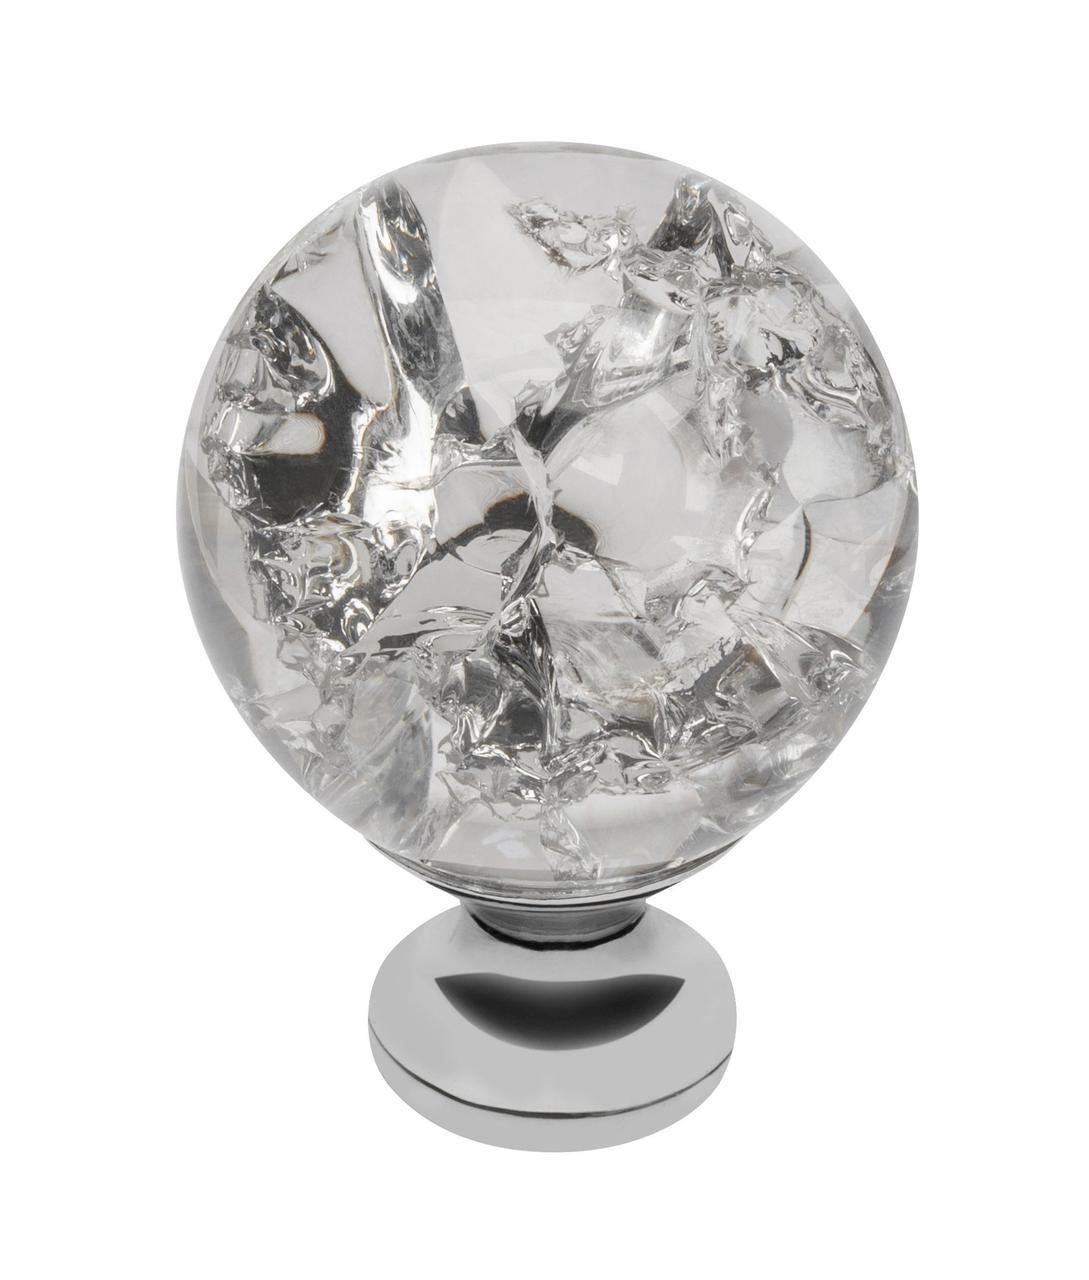 Ручка меблева GTV Crystal Palace D=30 мм Хром/Кристал (GZ-CRPC30-01)